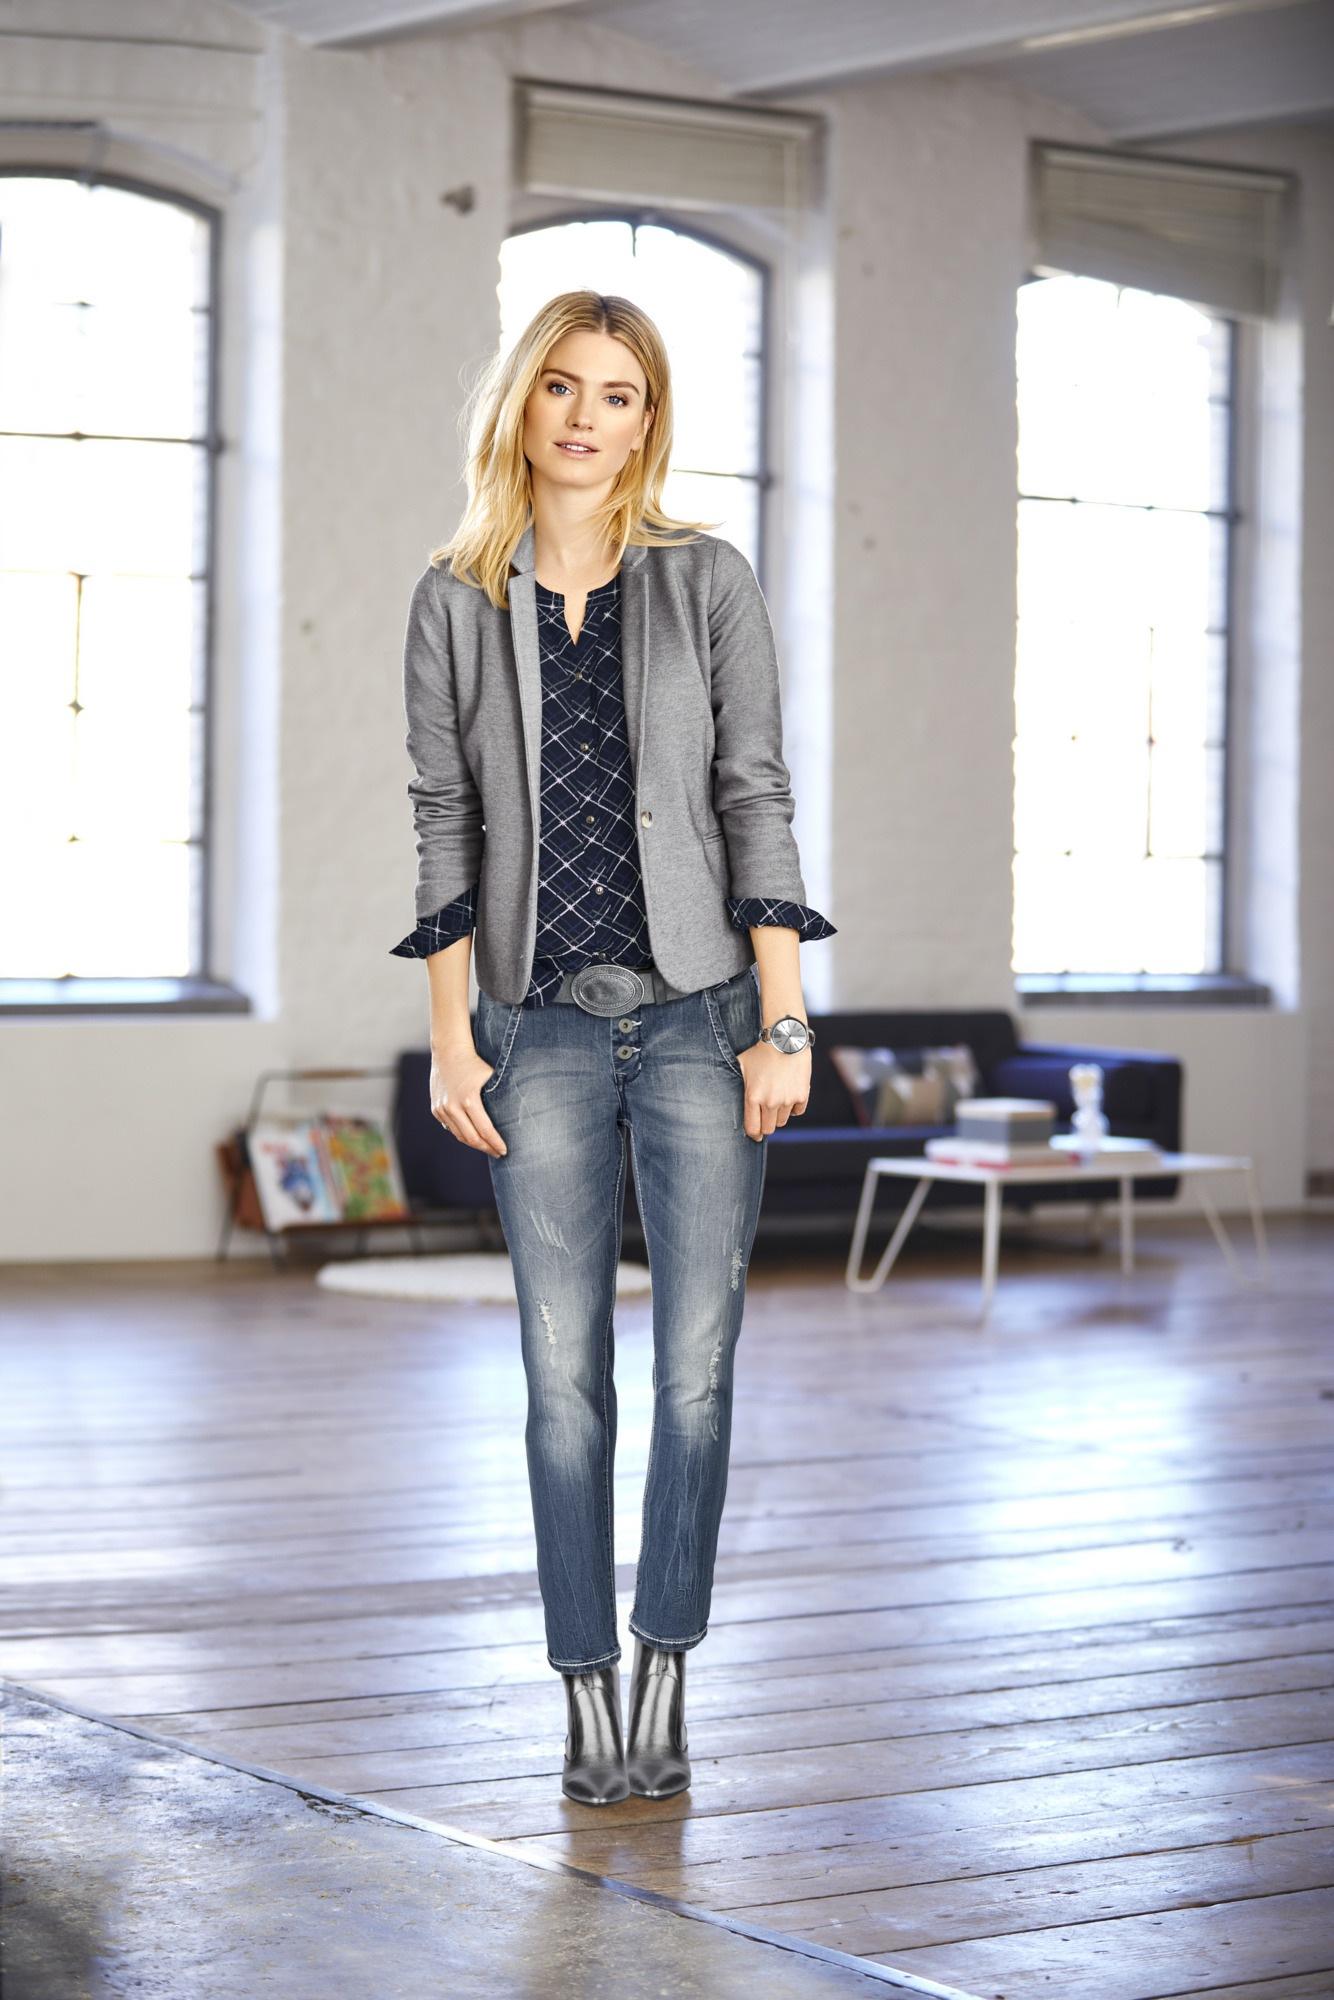 heine CASUAL Boyfriend-Jeans im Used-Look | Bekleidung > Jeans > Boyfriend-Jeans | Blau | Baumwolle - Elasthan | Heine Casual